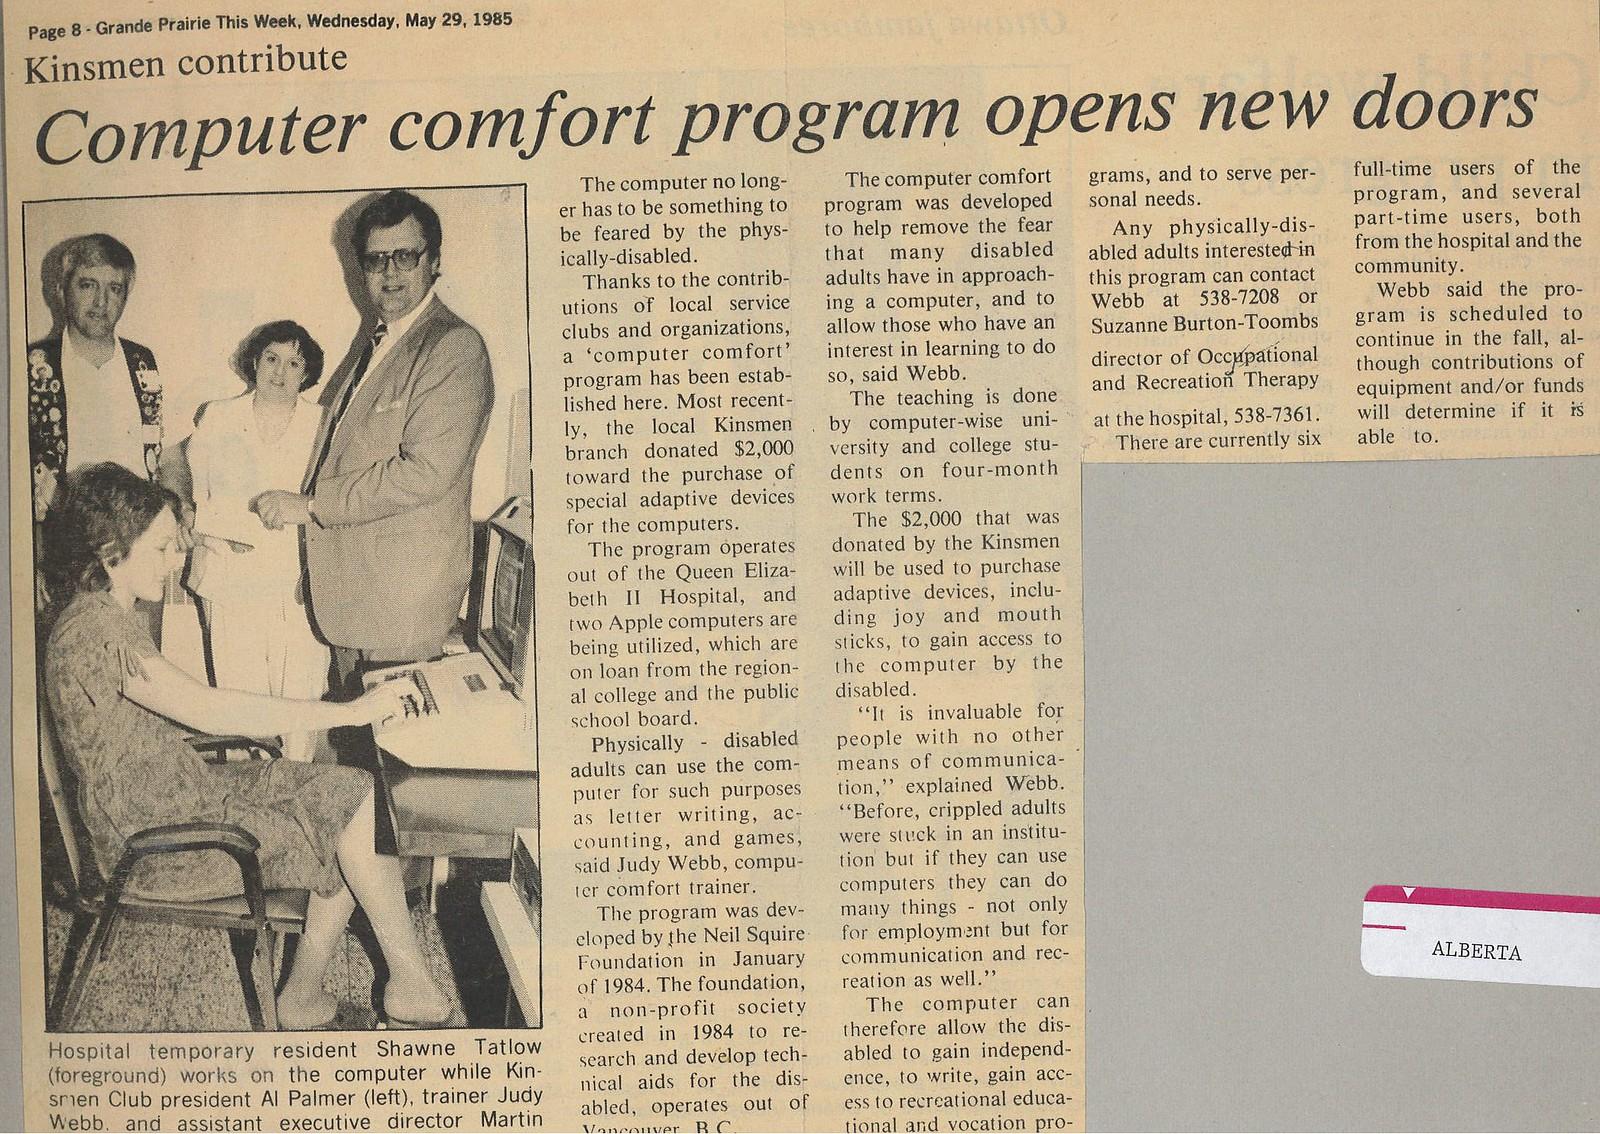 Newspaper Clipping from Grand Prairie. Headline: Computer Comfort Program opens new doors.